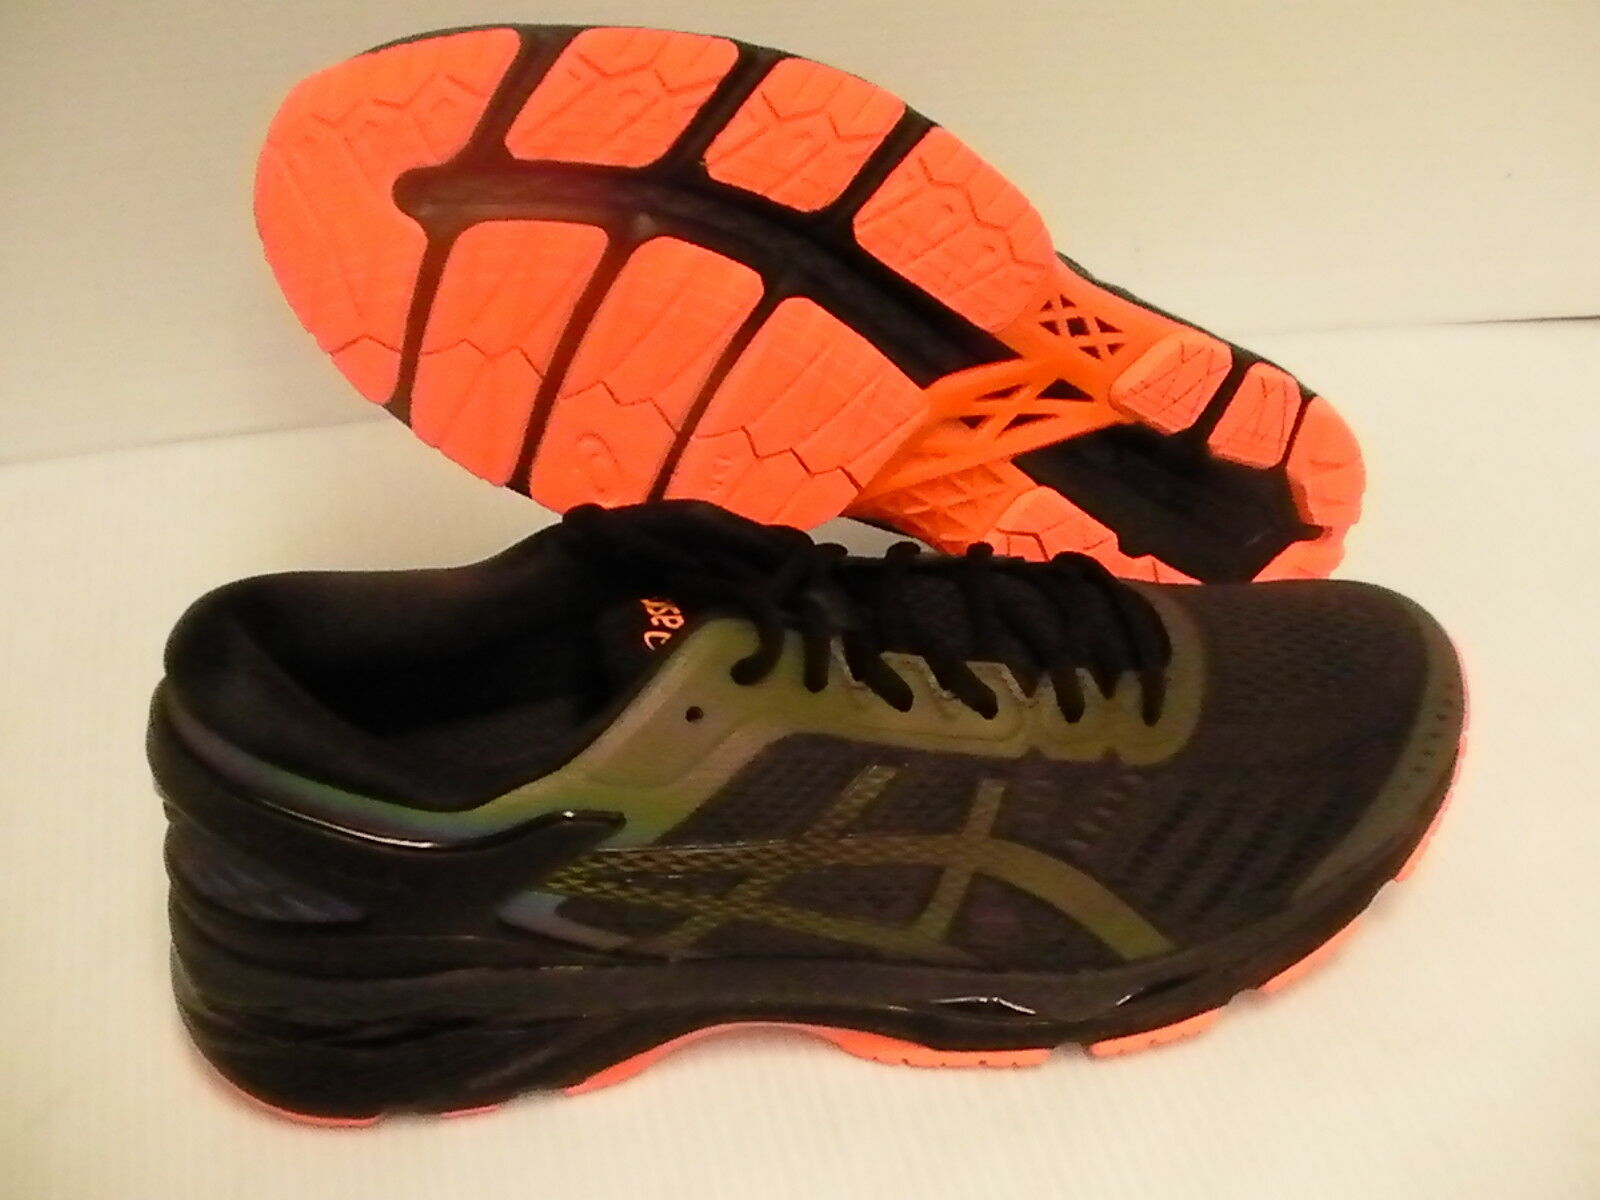 Asics men's gel kayano 24 lite black show running shoes phantom black lite size 10 us 3d3240